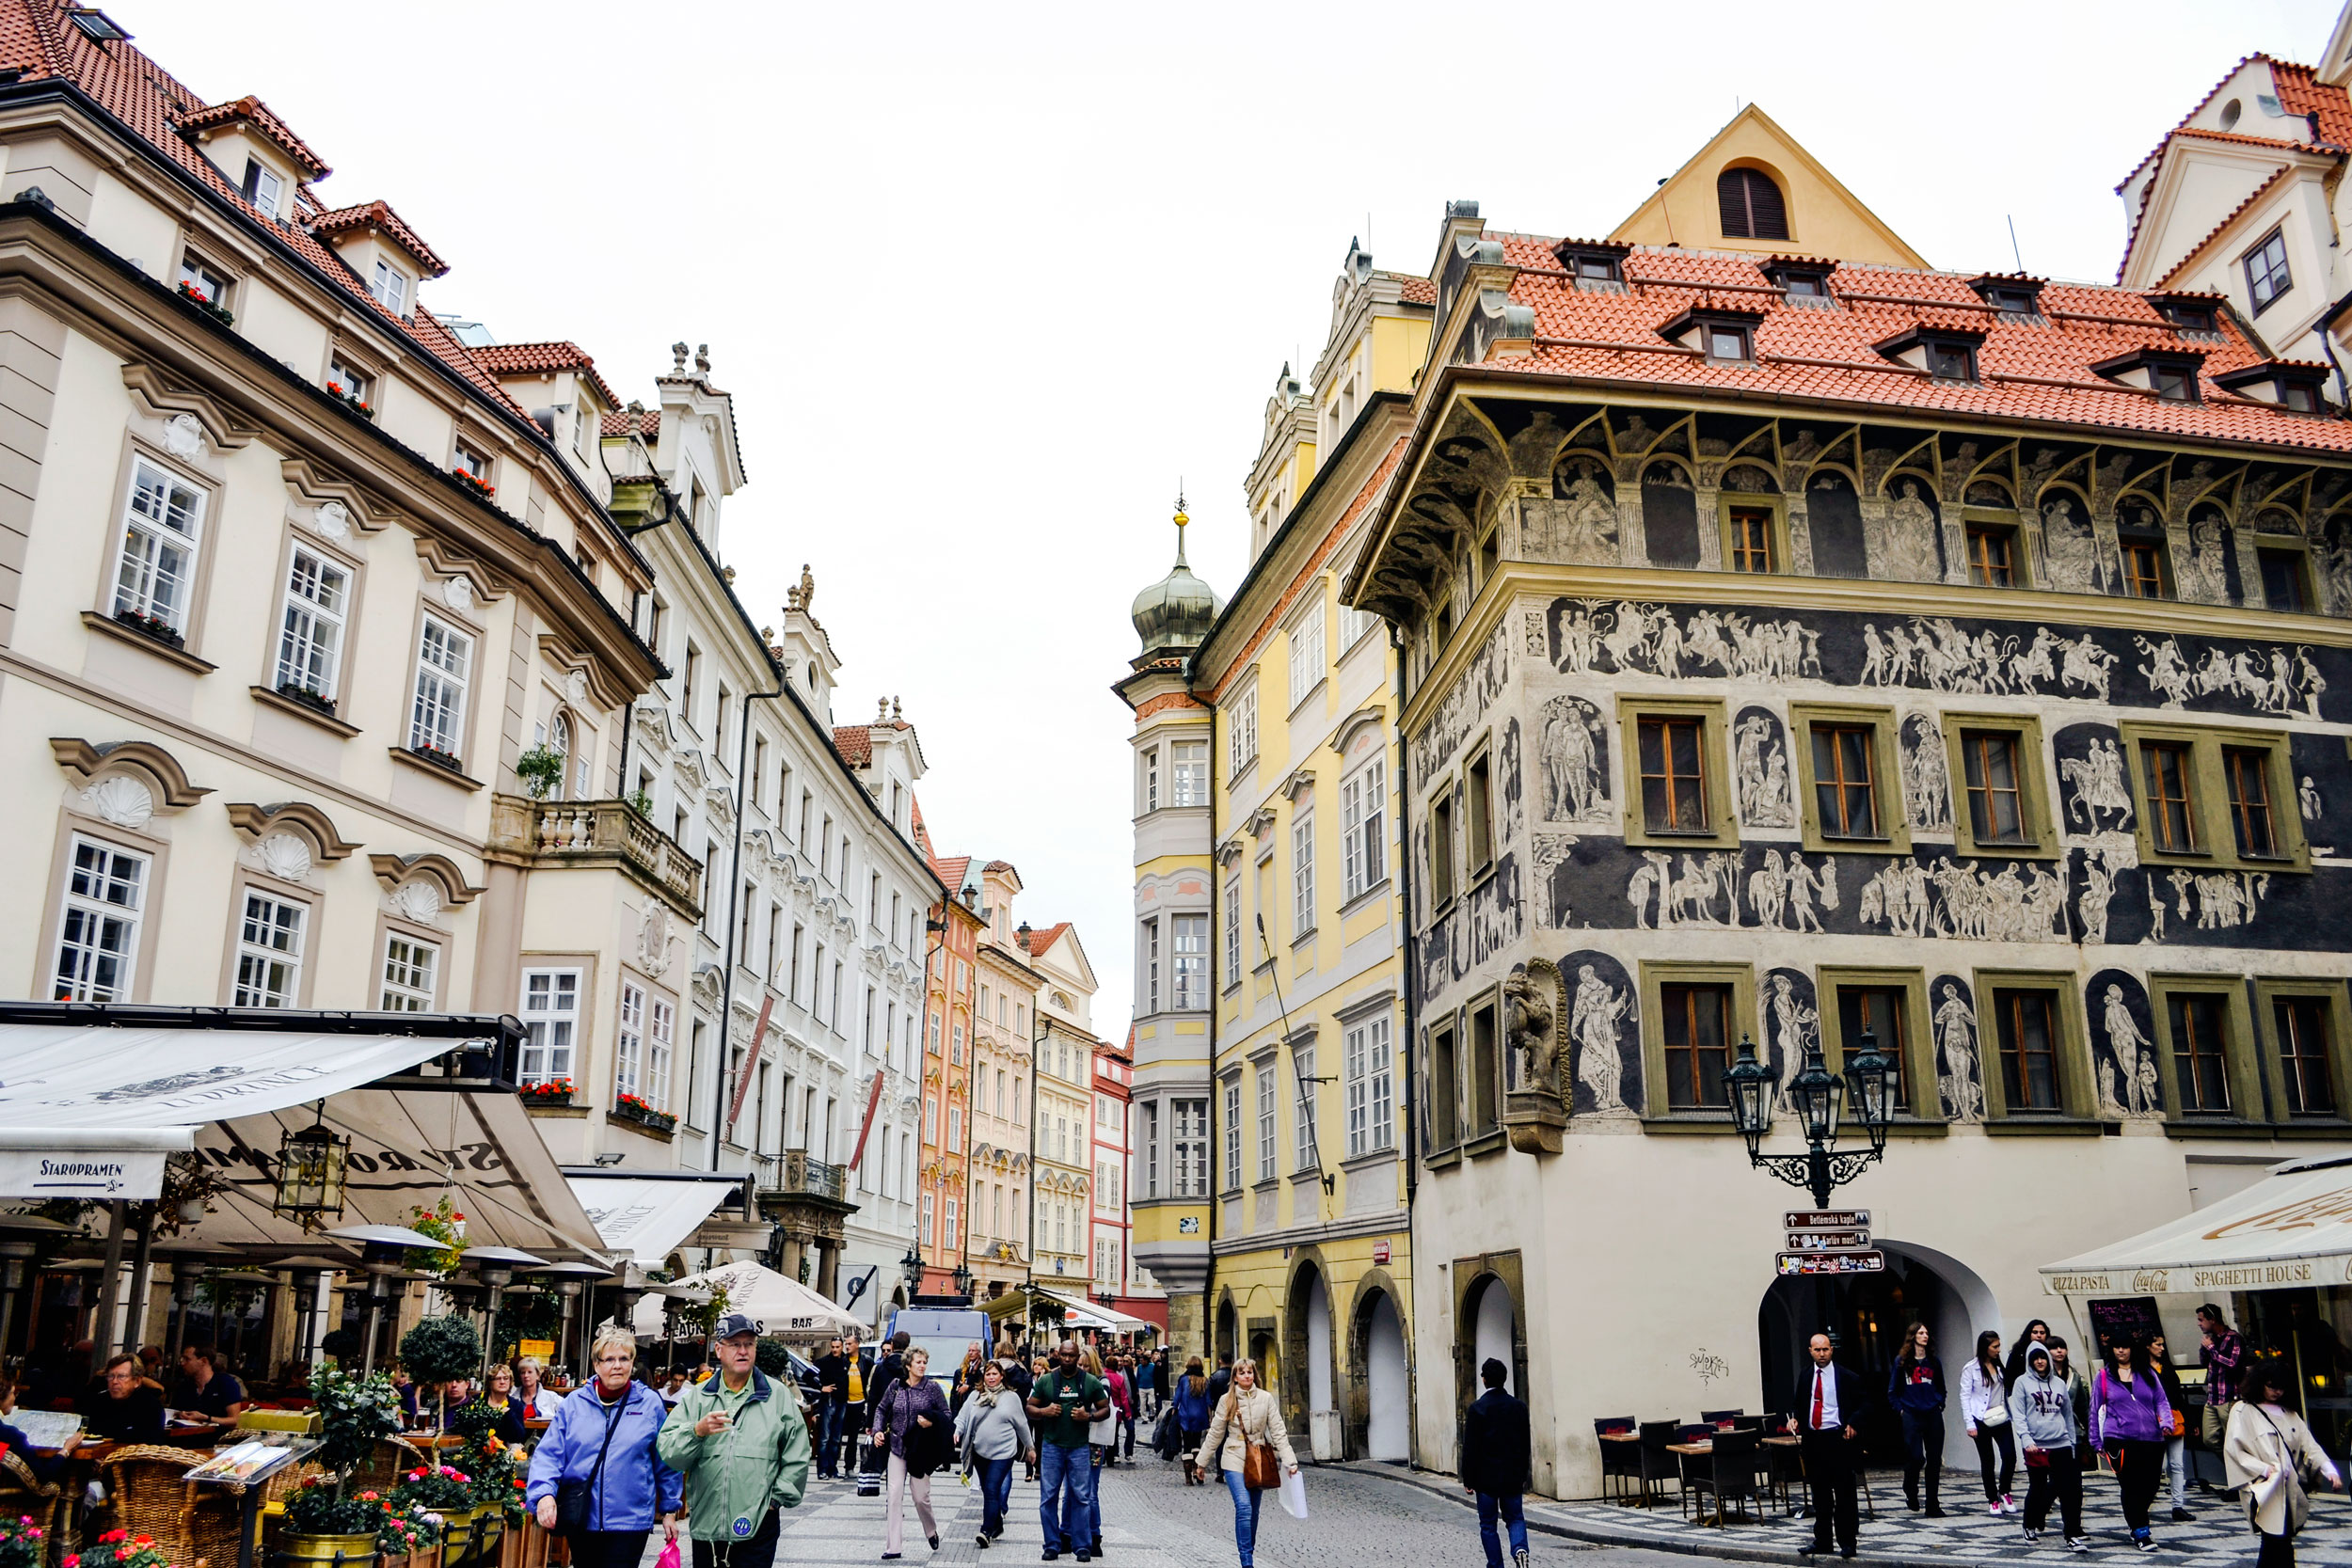 Walking through the streets of Prague